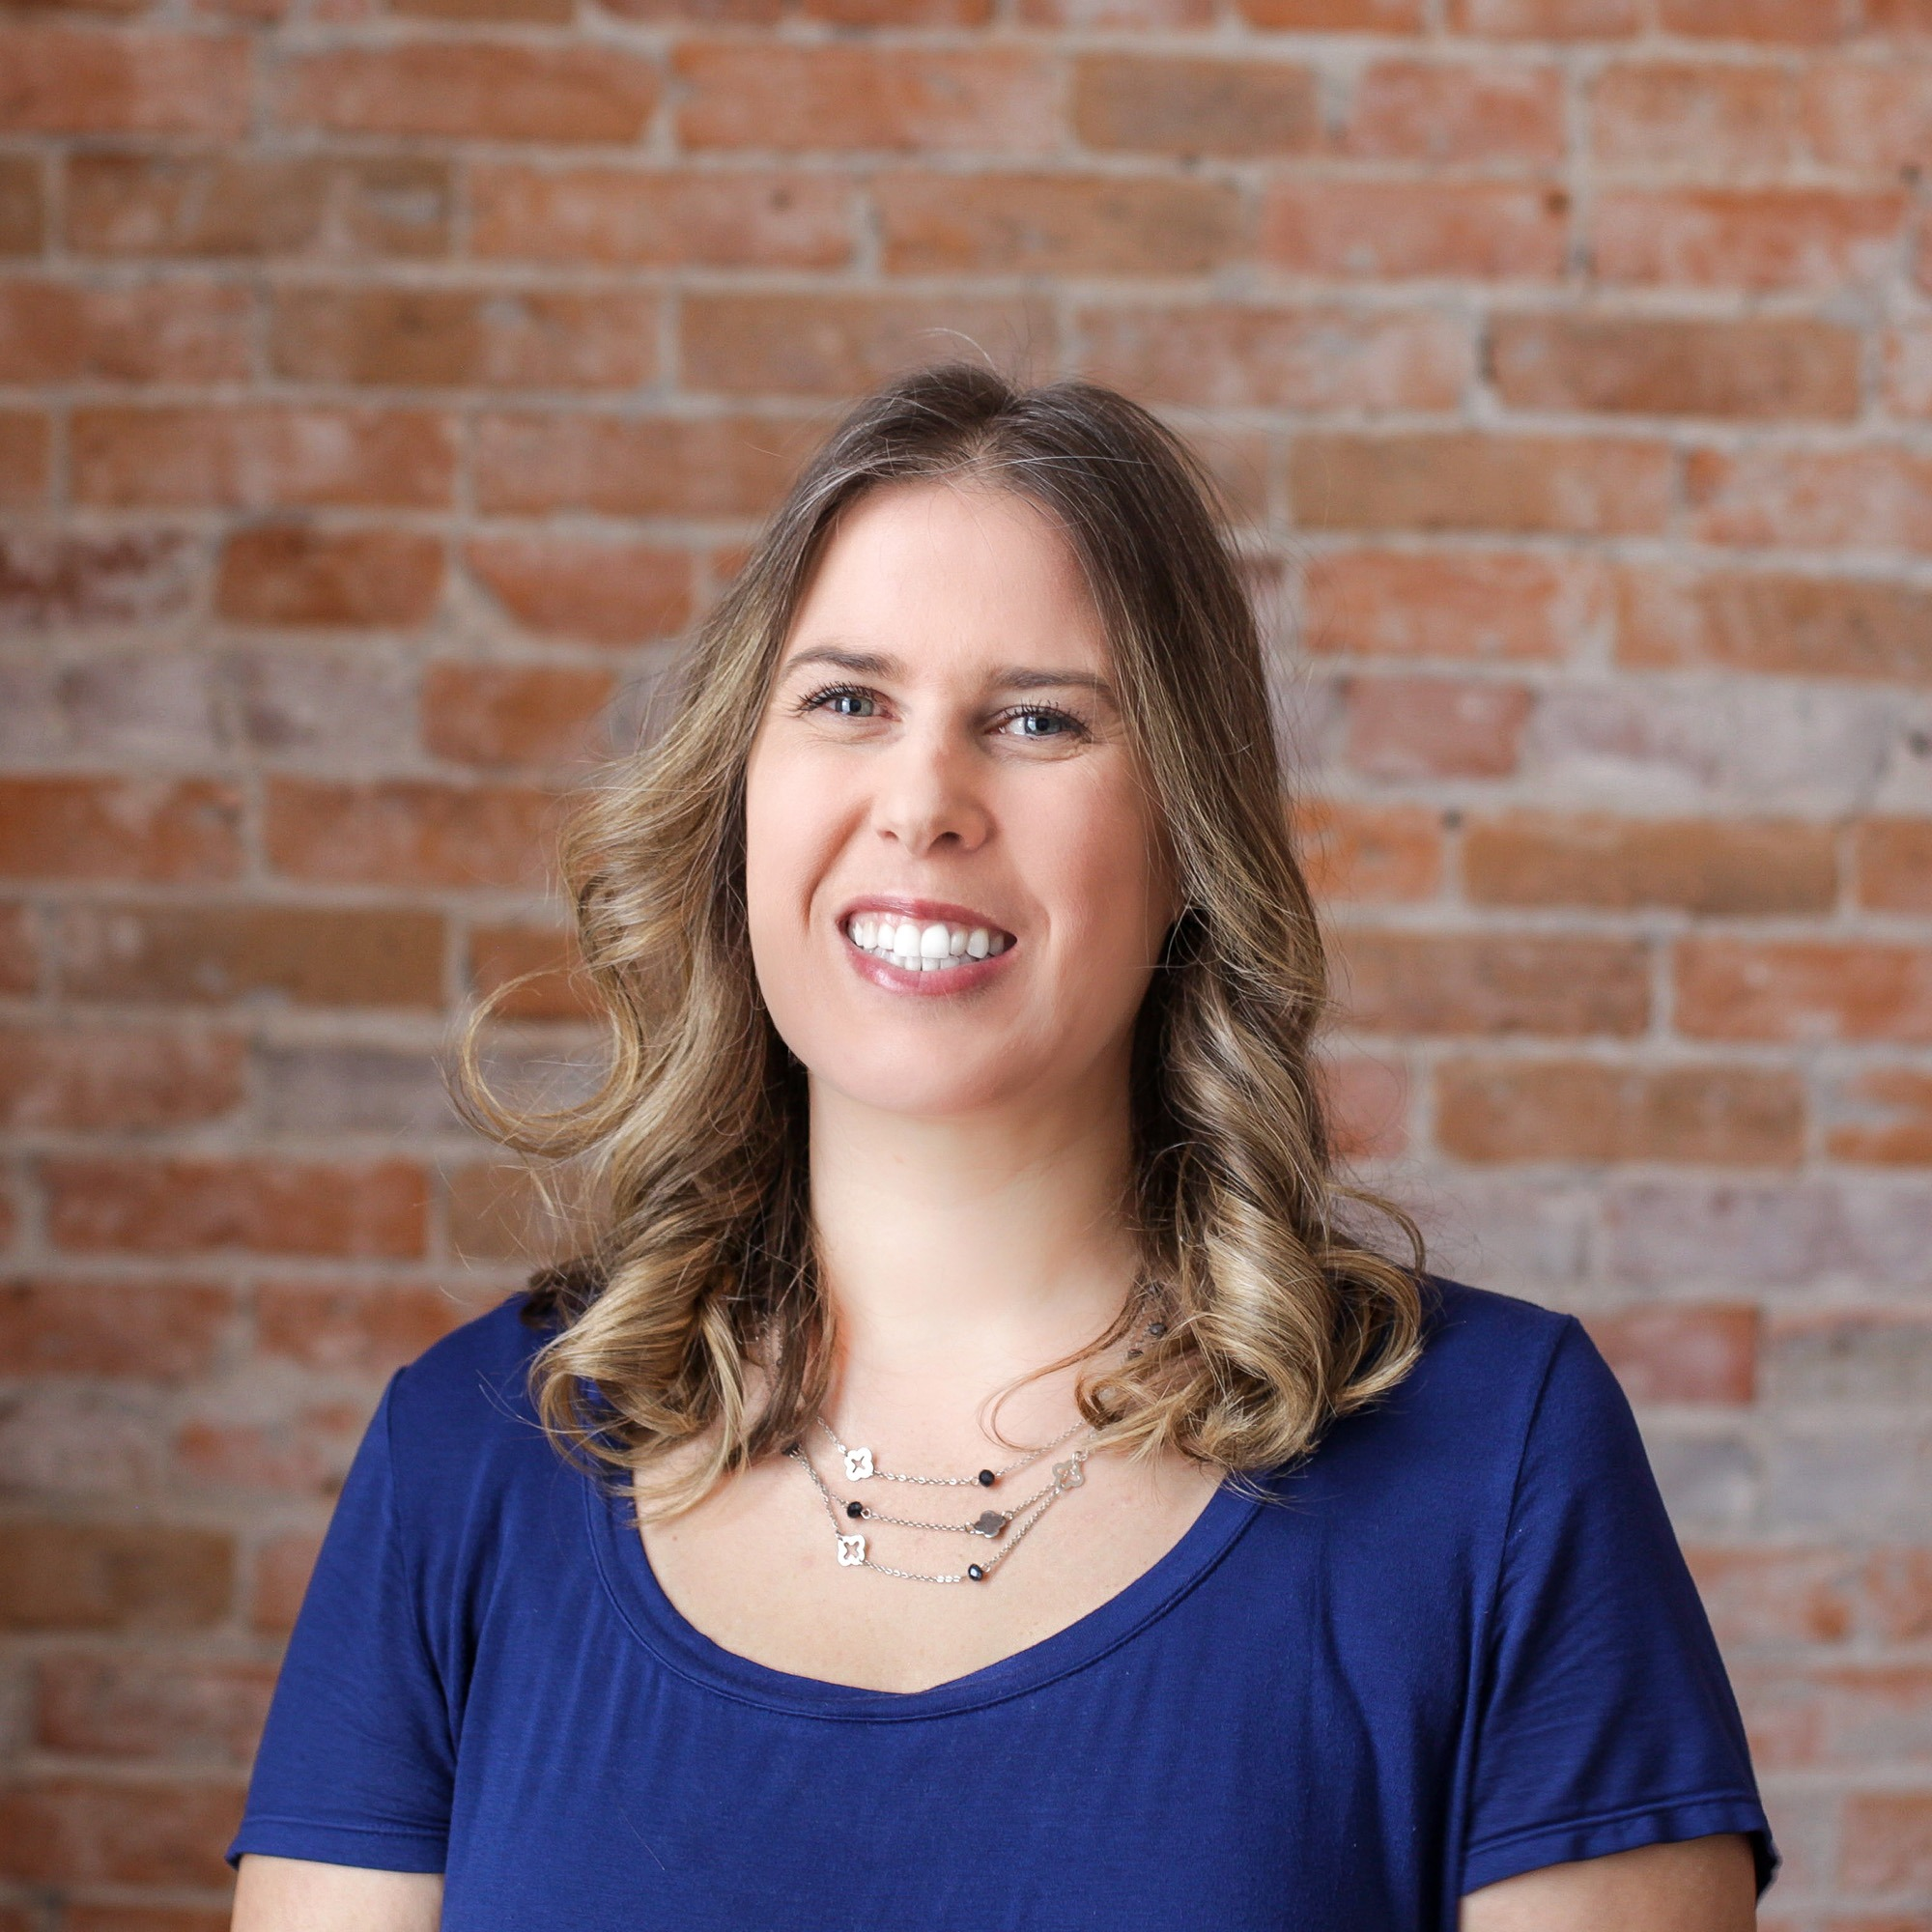 Emily Valdez - HMK Company - Education Liason